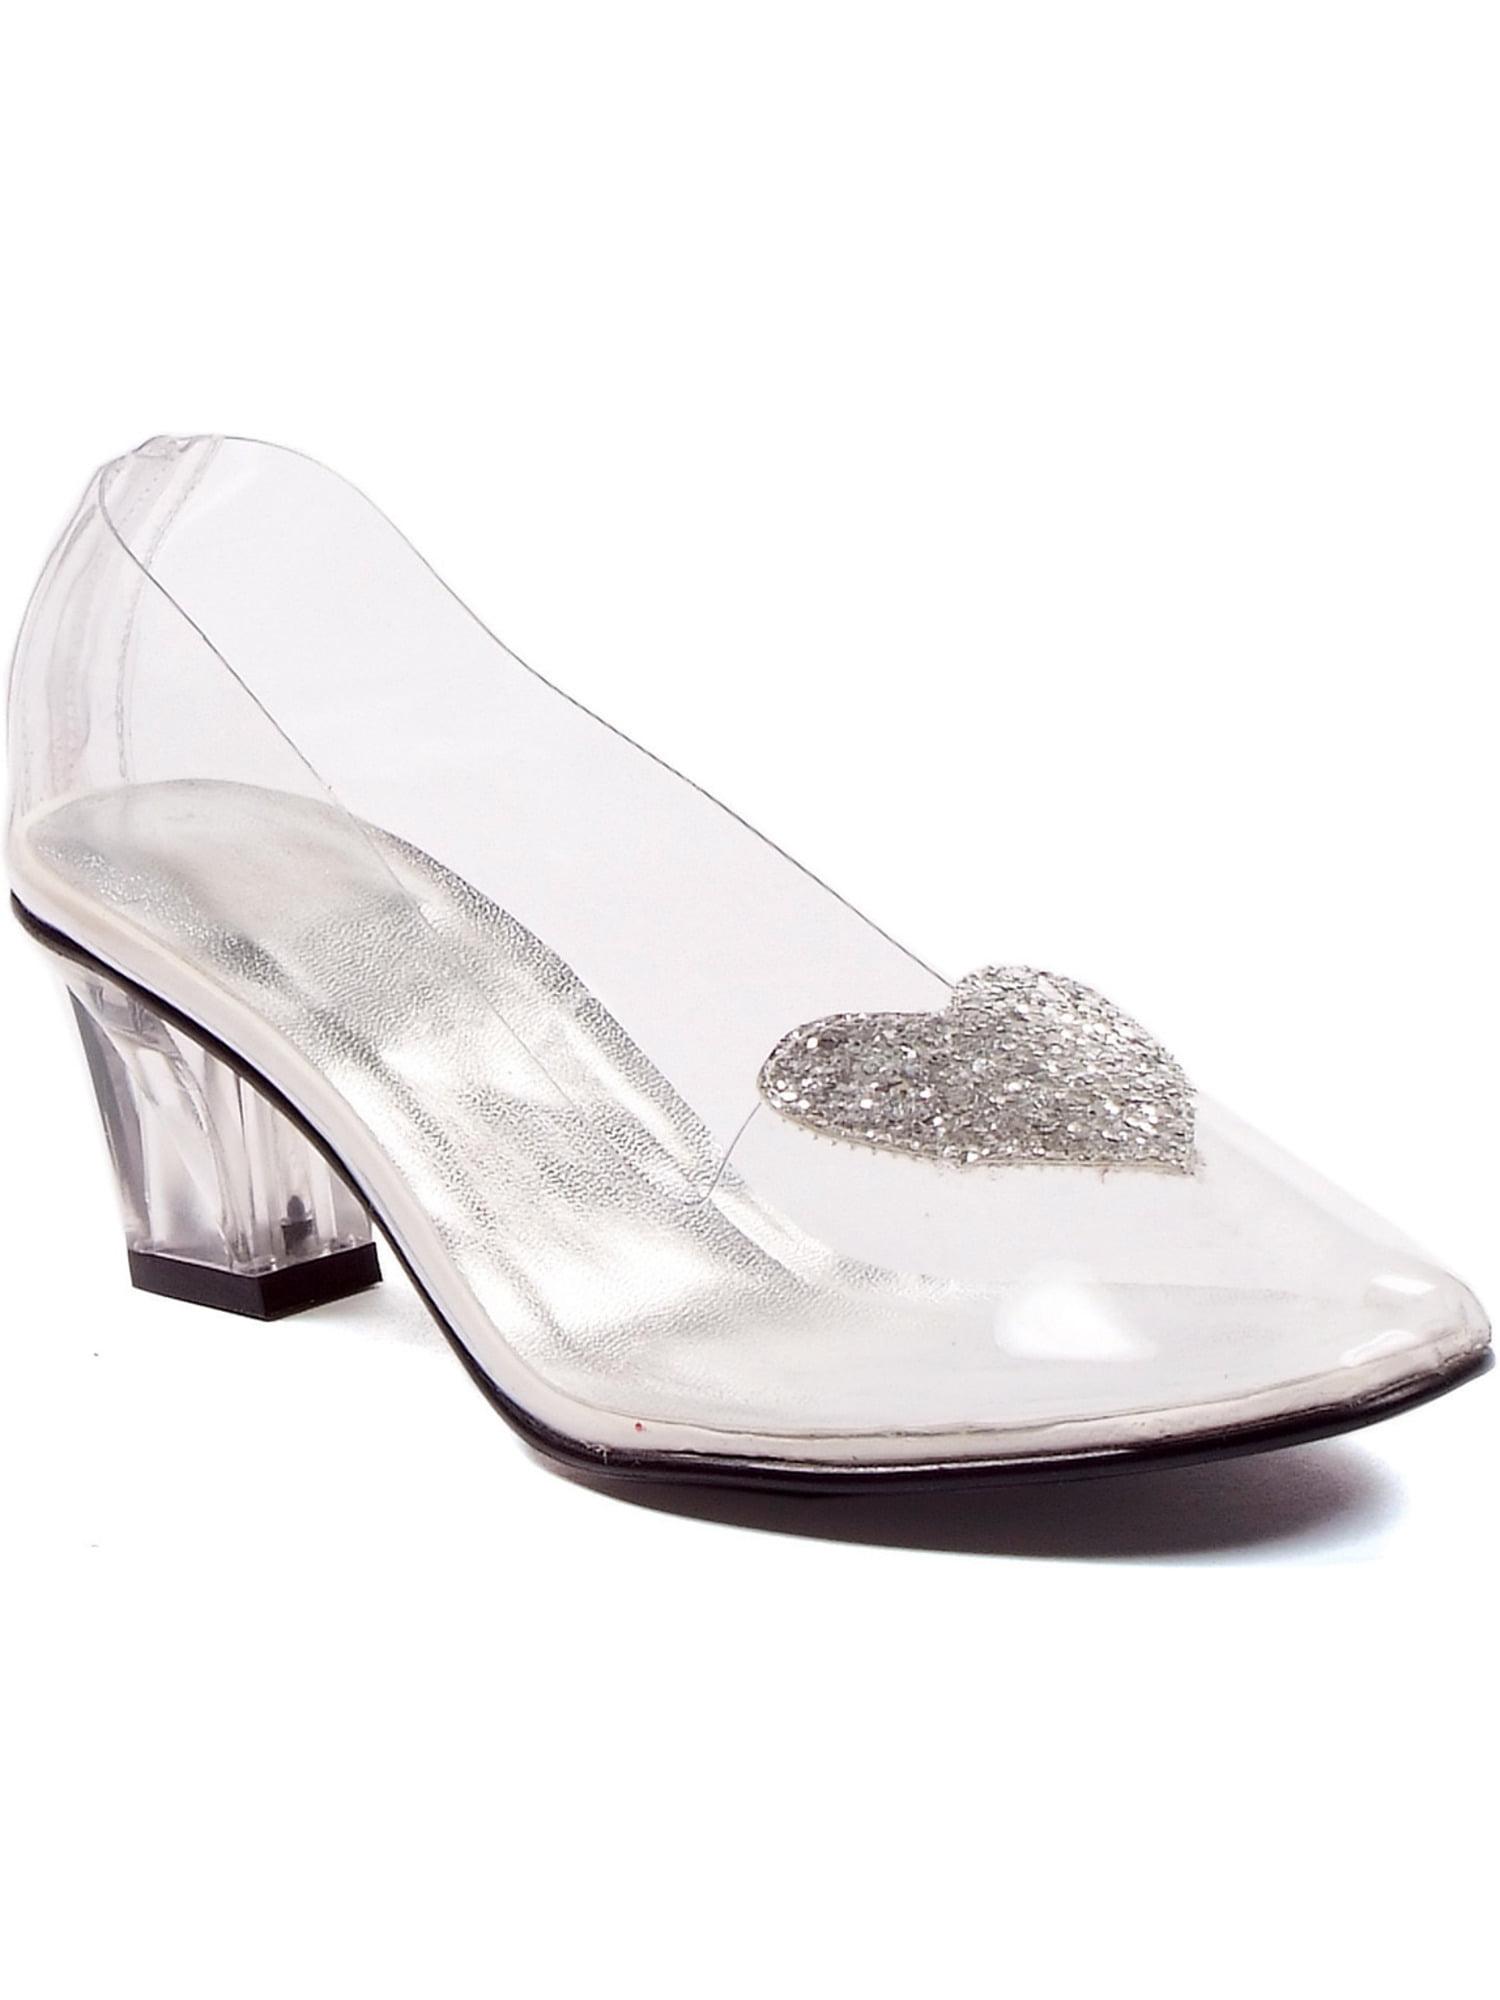 1031 Shoes Womens Sexy Clear Shoes Heeled Pump Slipper With Silver Glitter Heart Princess Walmart Com Walmart Com